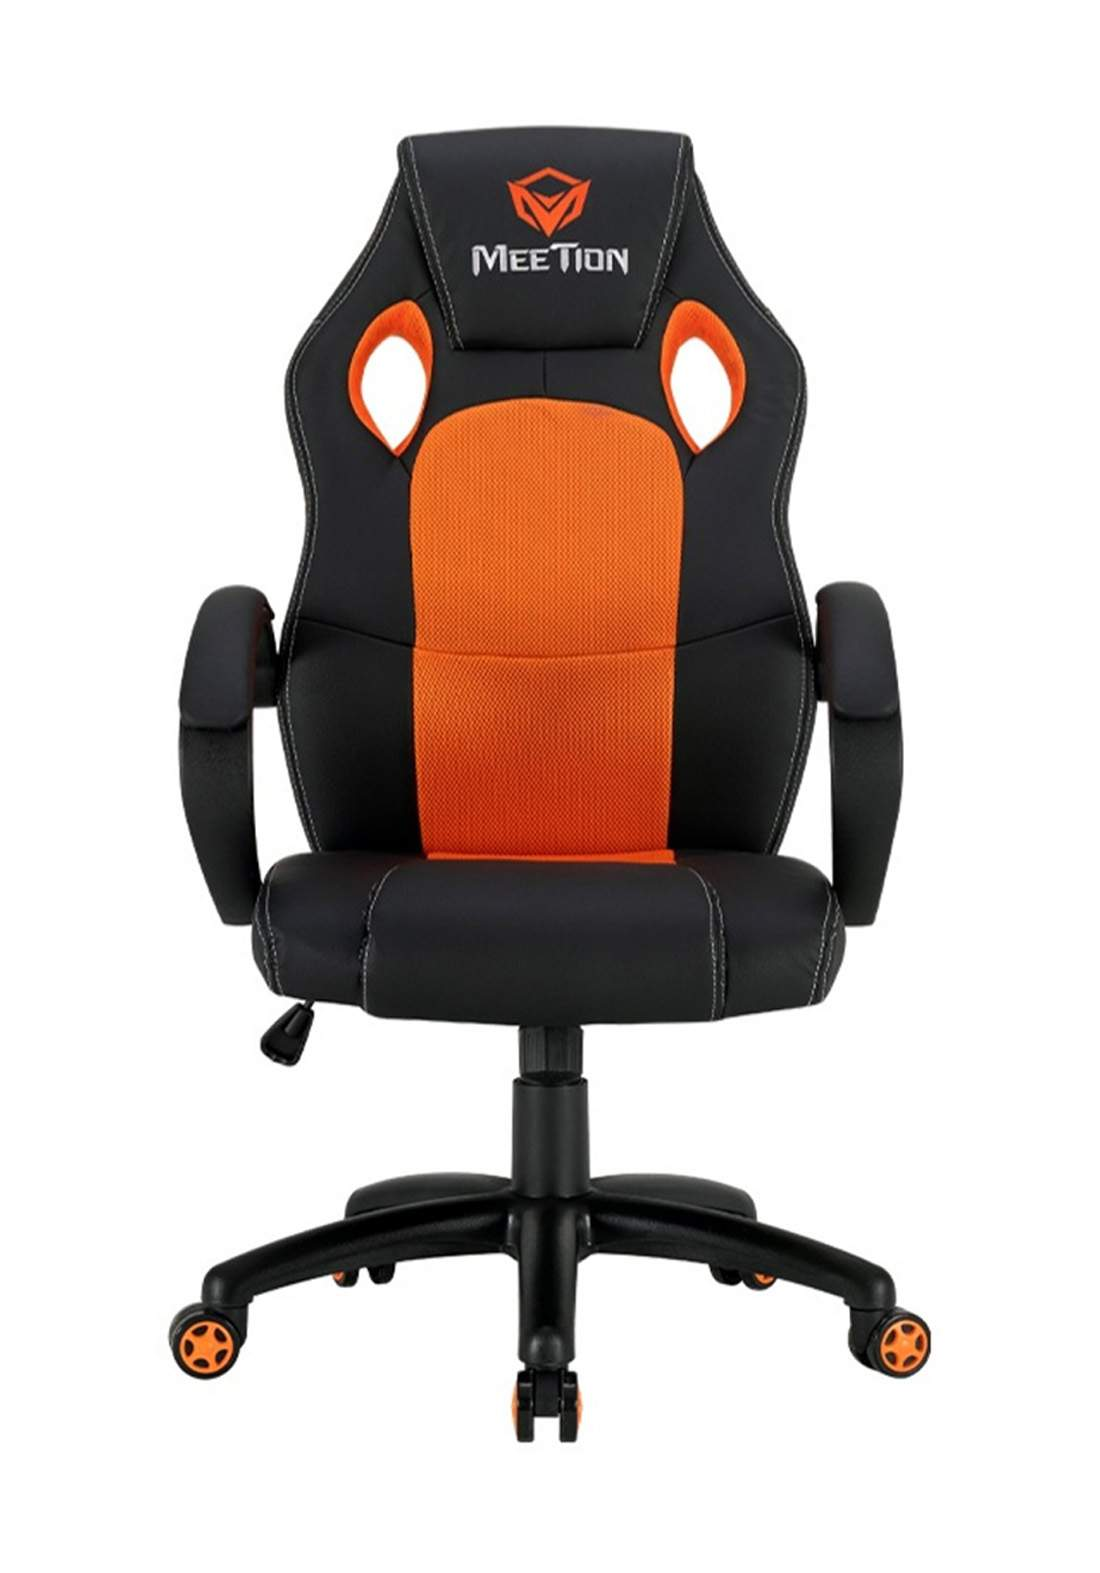 Meetion CHR05 E-Sport Gaming Chair - Orange كرسي ألعاب